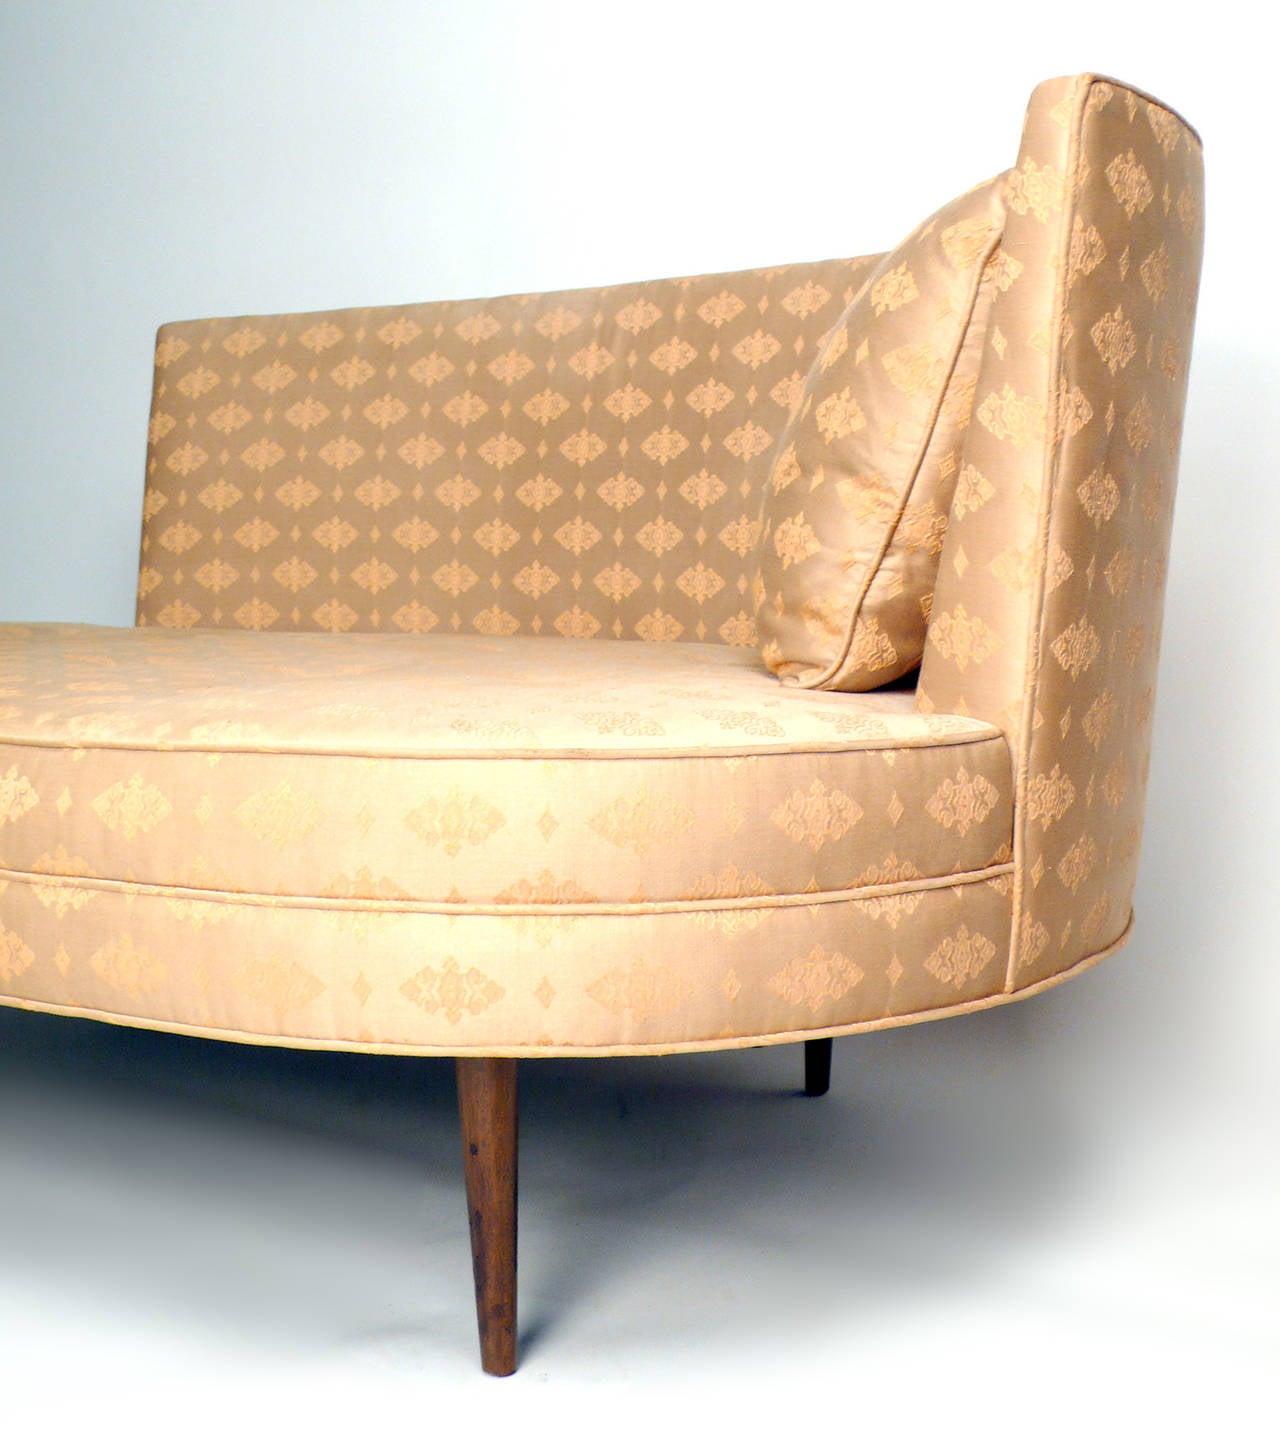 Harvey Probber Recamier Chaise At 1stdibs